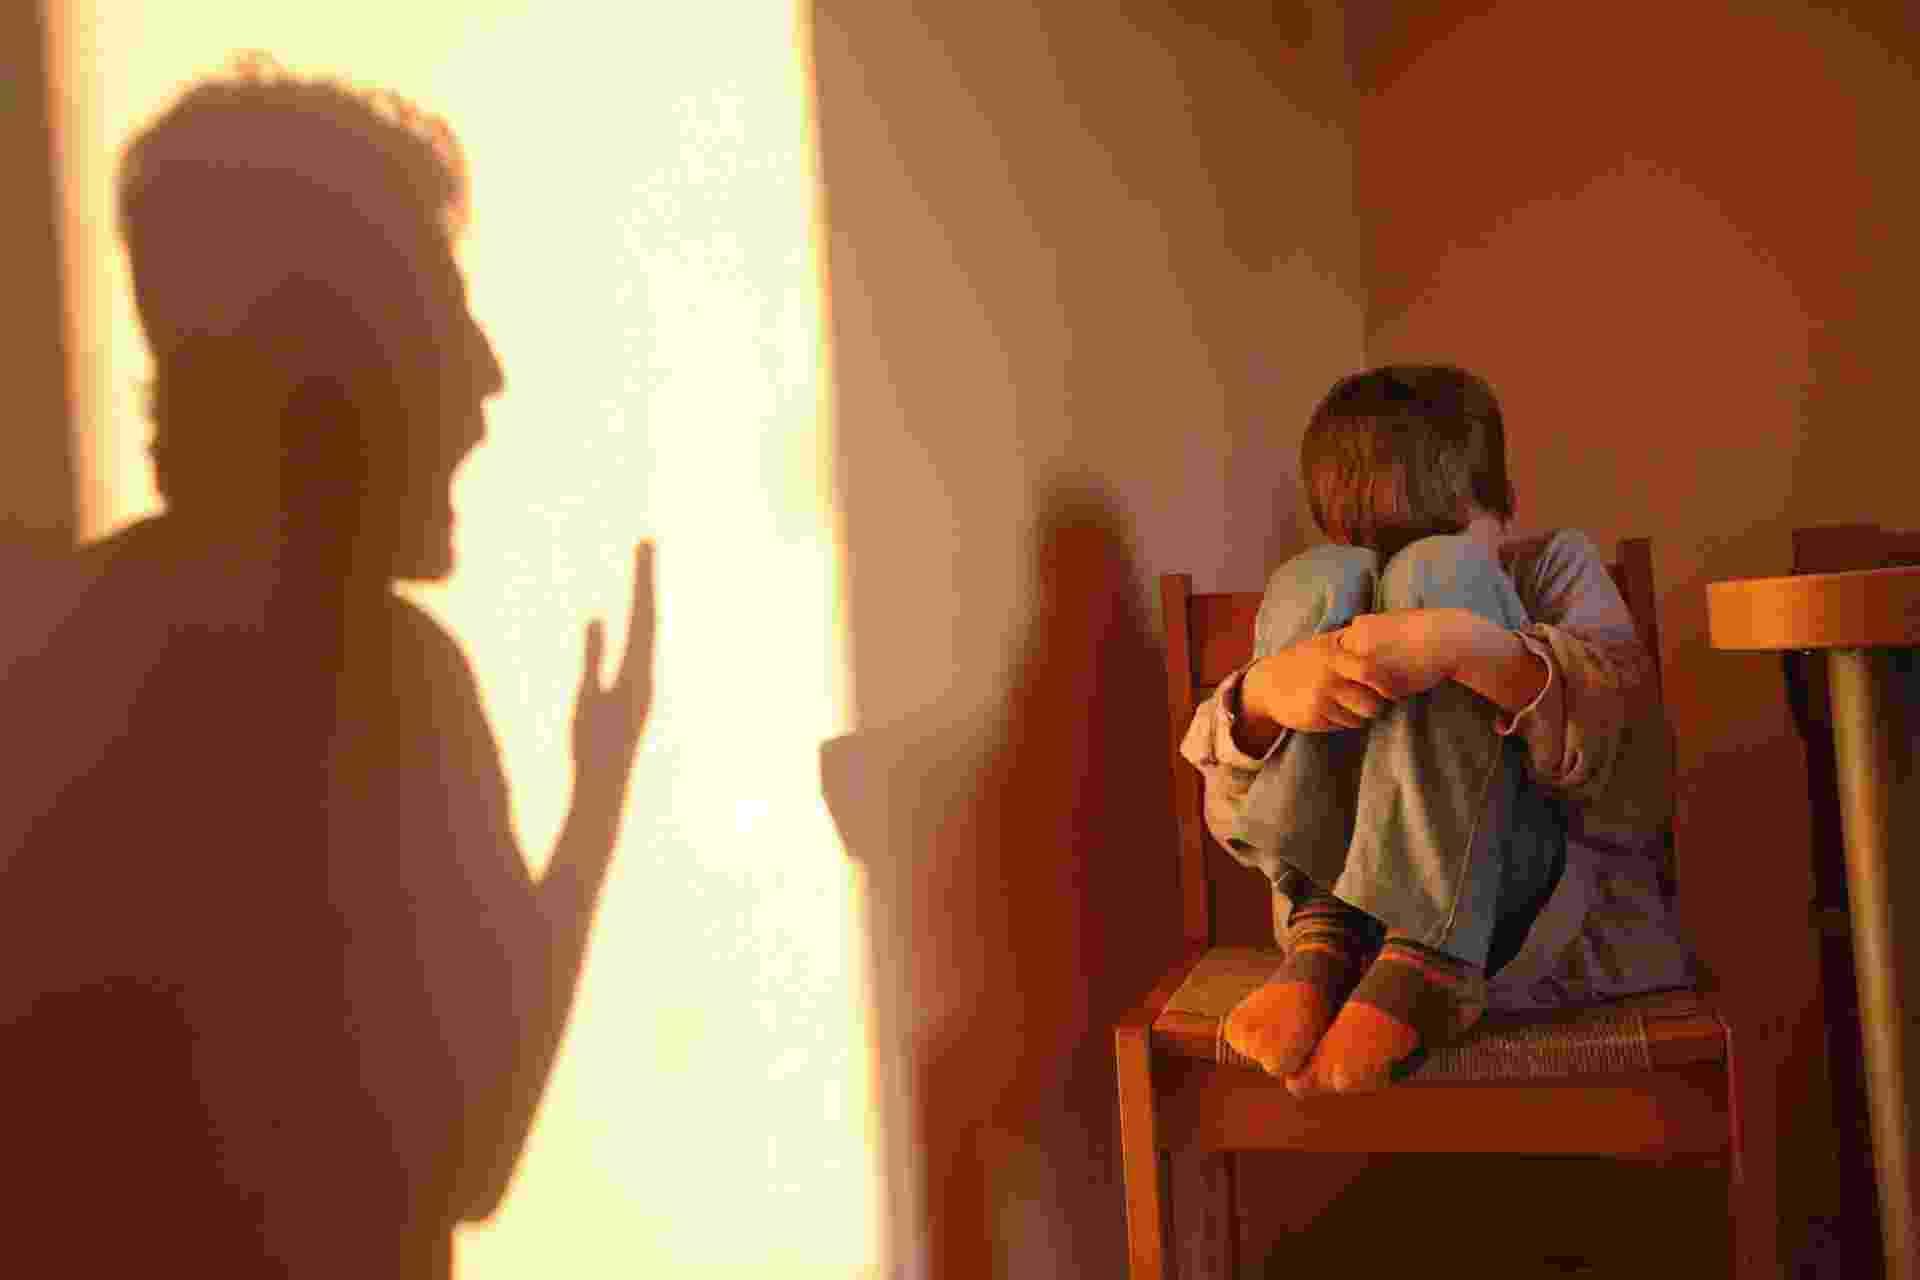 9.abr.2014- menino, medo, agressão infantil. abuso infantil - Thinkstock